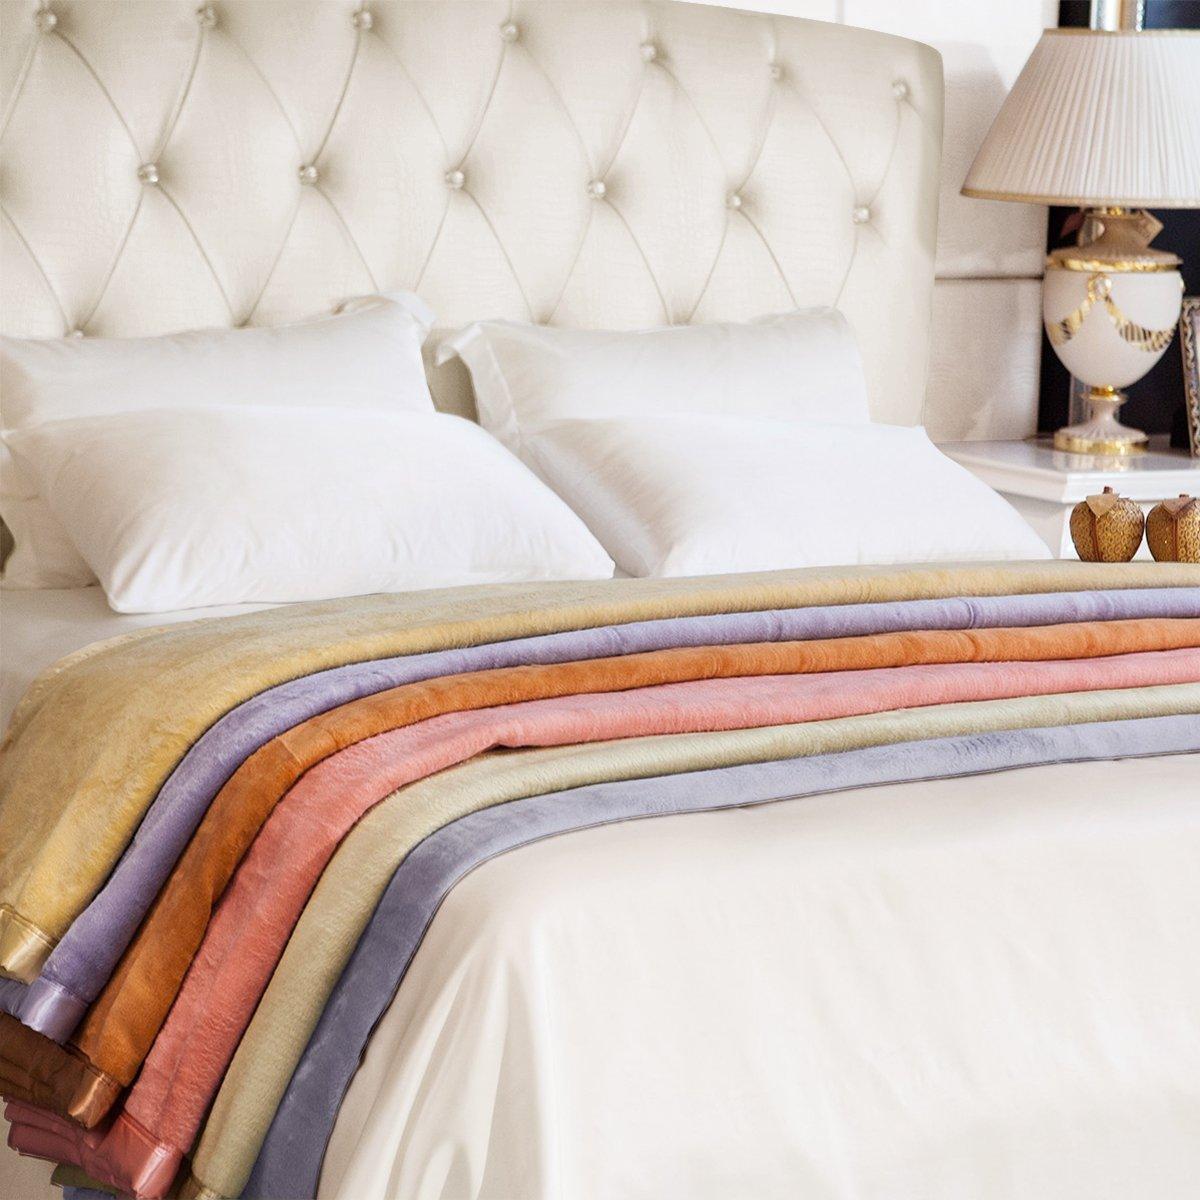 ELLESILK Pure Silk Blanket, the Highest Grade (6A) Long Fiber Silk, Comfort and Warmth, Super Soft, Ivory, Twin